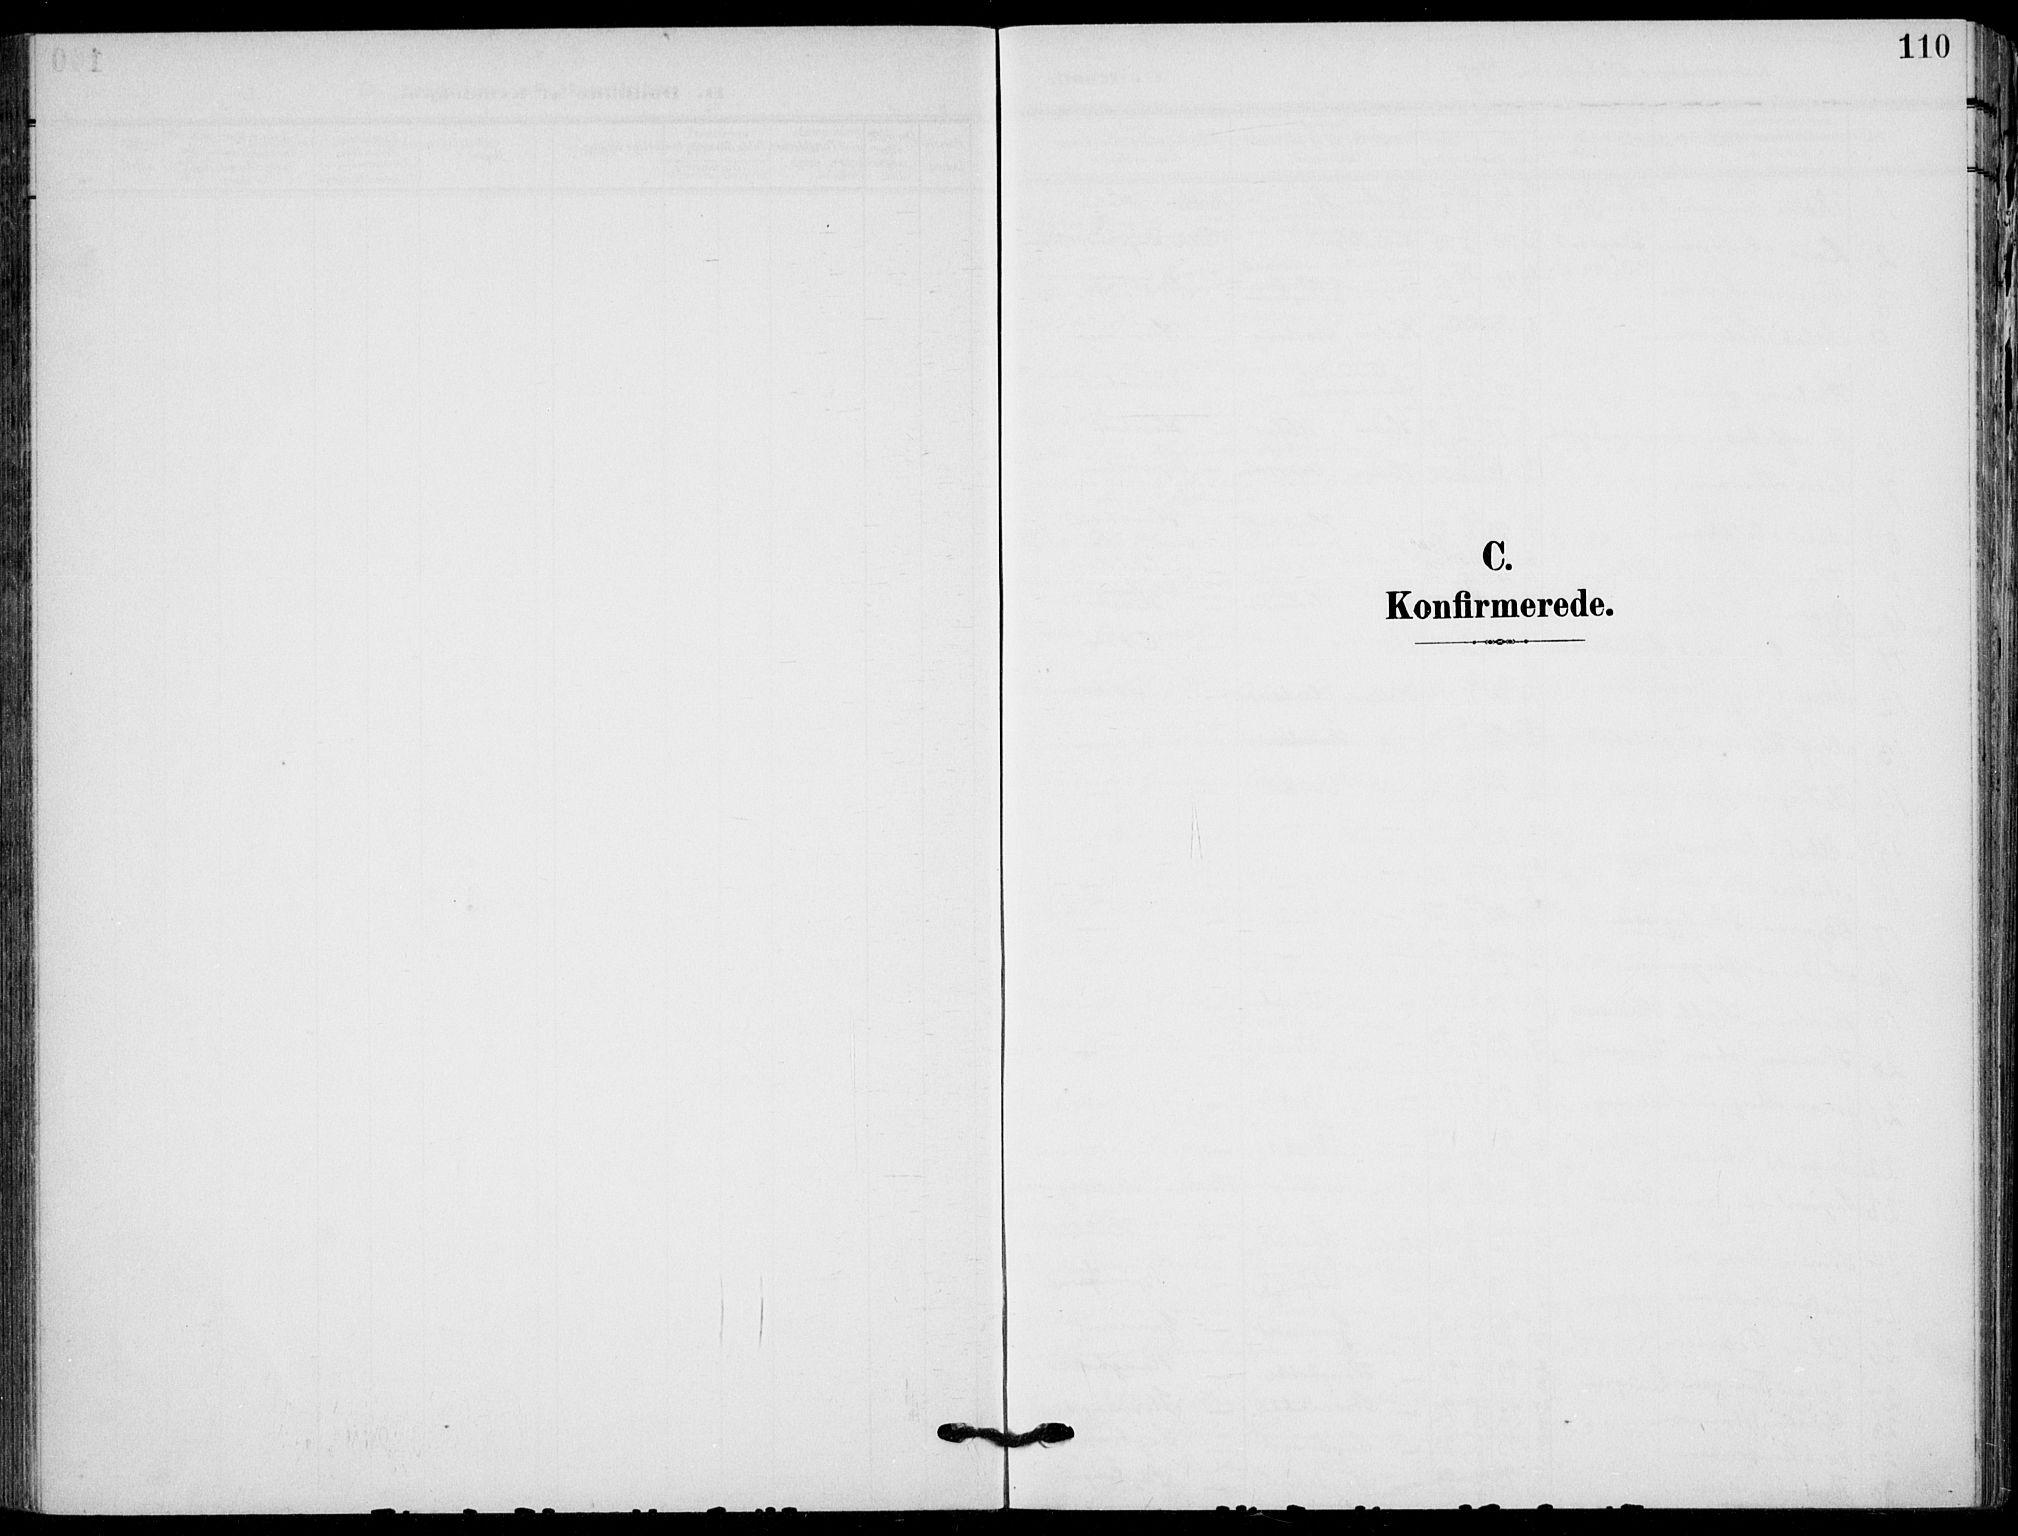 SAKO, Holla kirkebøker, F/Fa/L0012: Ministerialbok nr. 12, 1907-1923, s. 110